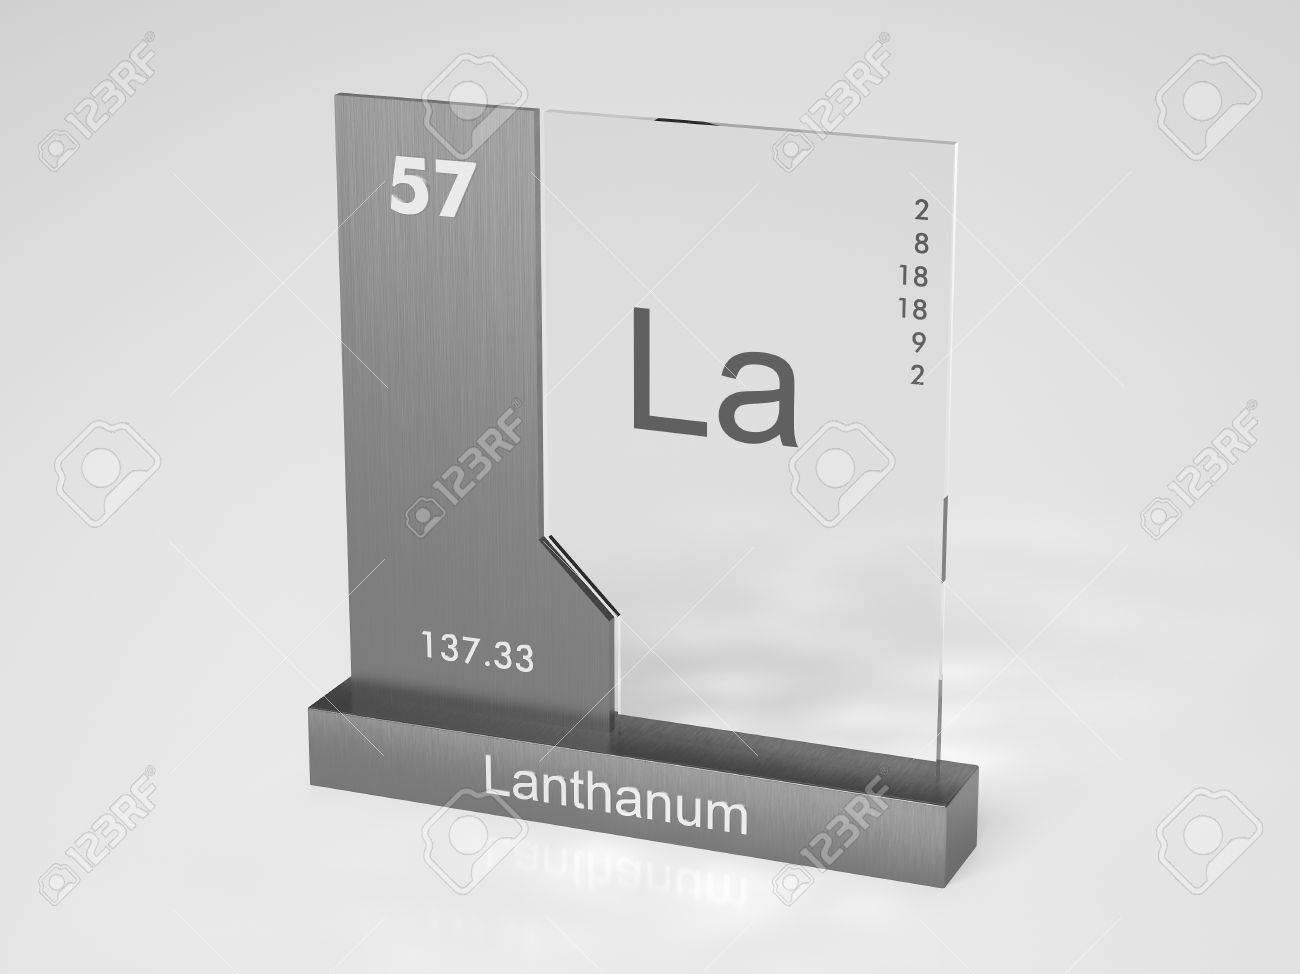 Lanthanum symbol la chemical element of the periodic table lanthanum symbol la chemical element of the periodic table stock photo 10470016 gamestrikefo Gallery